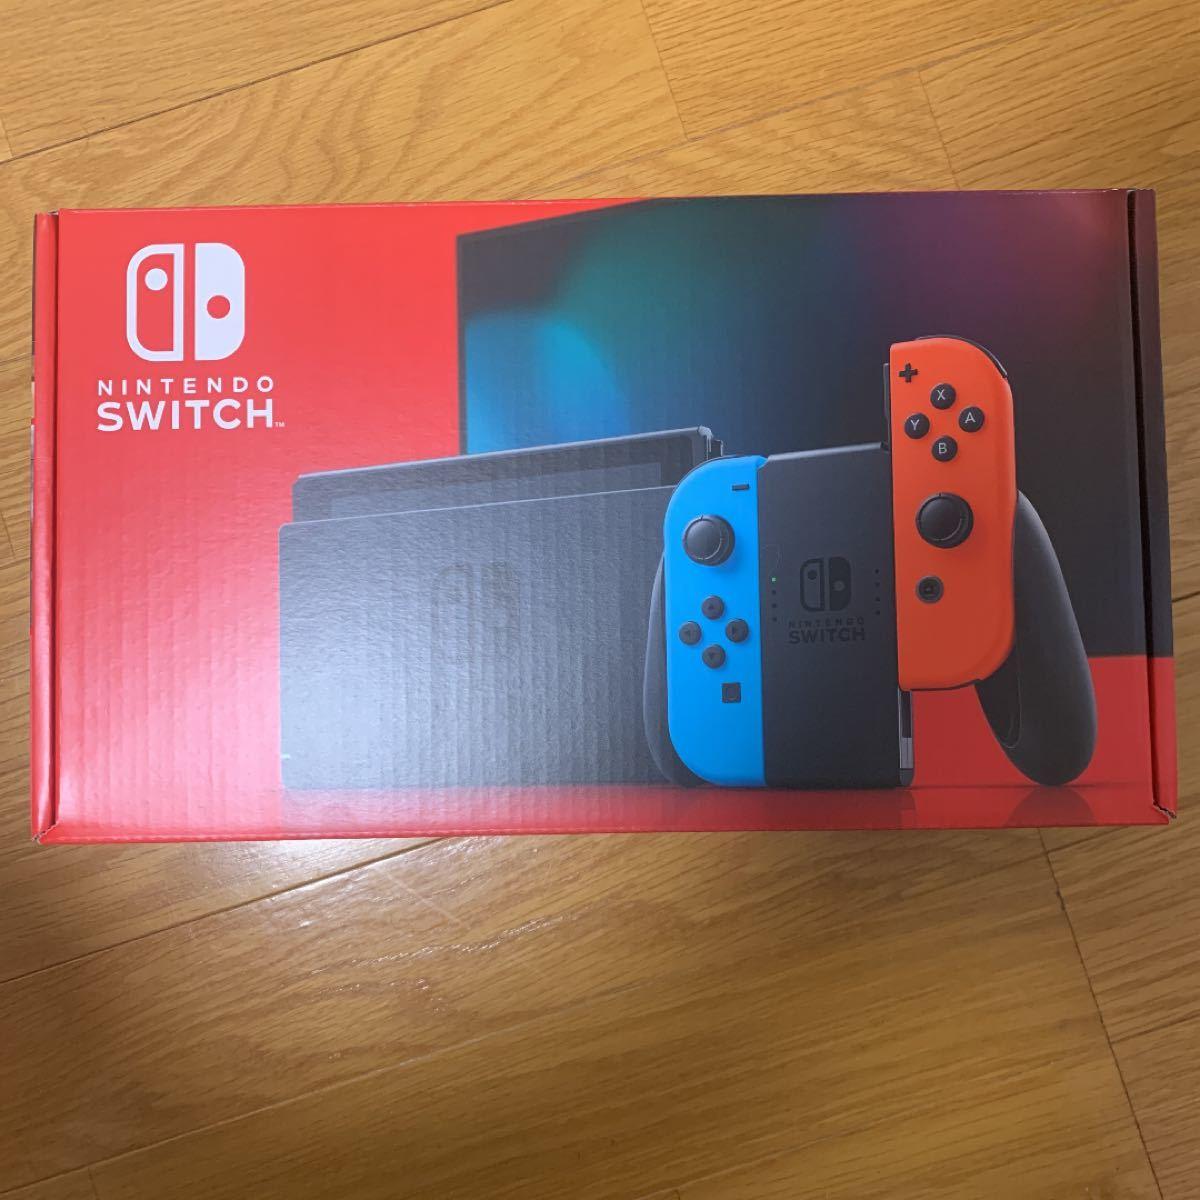 Nintendo Switch ニンテンドースイッチ本体 ネオンブルー